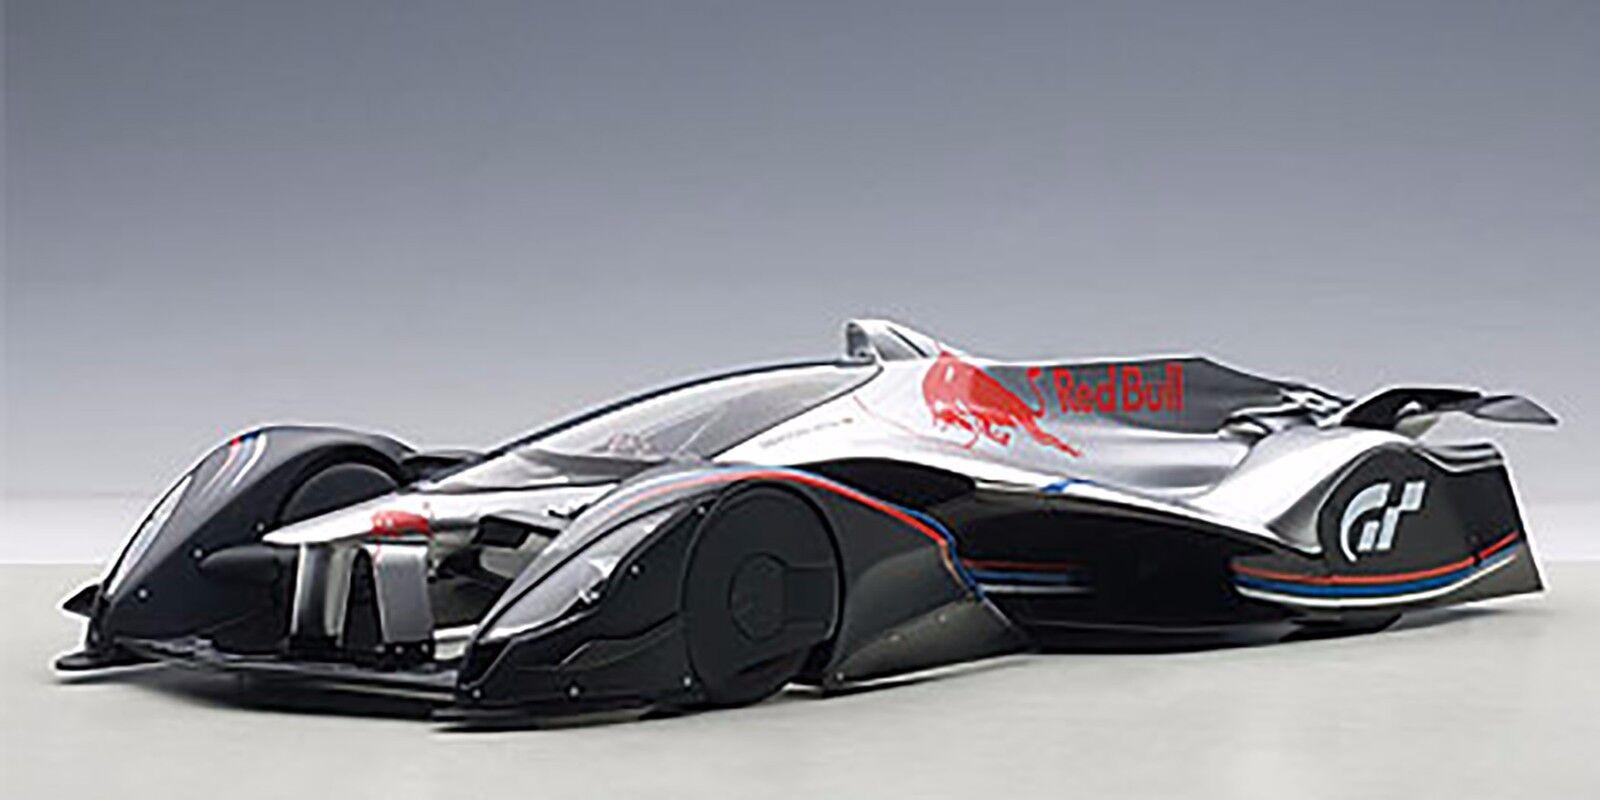 Autoart rougebull X2014 Ventilateur Voiture Hyper Argent 1 18 Echelle